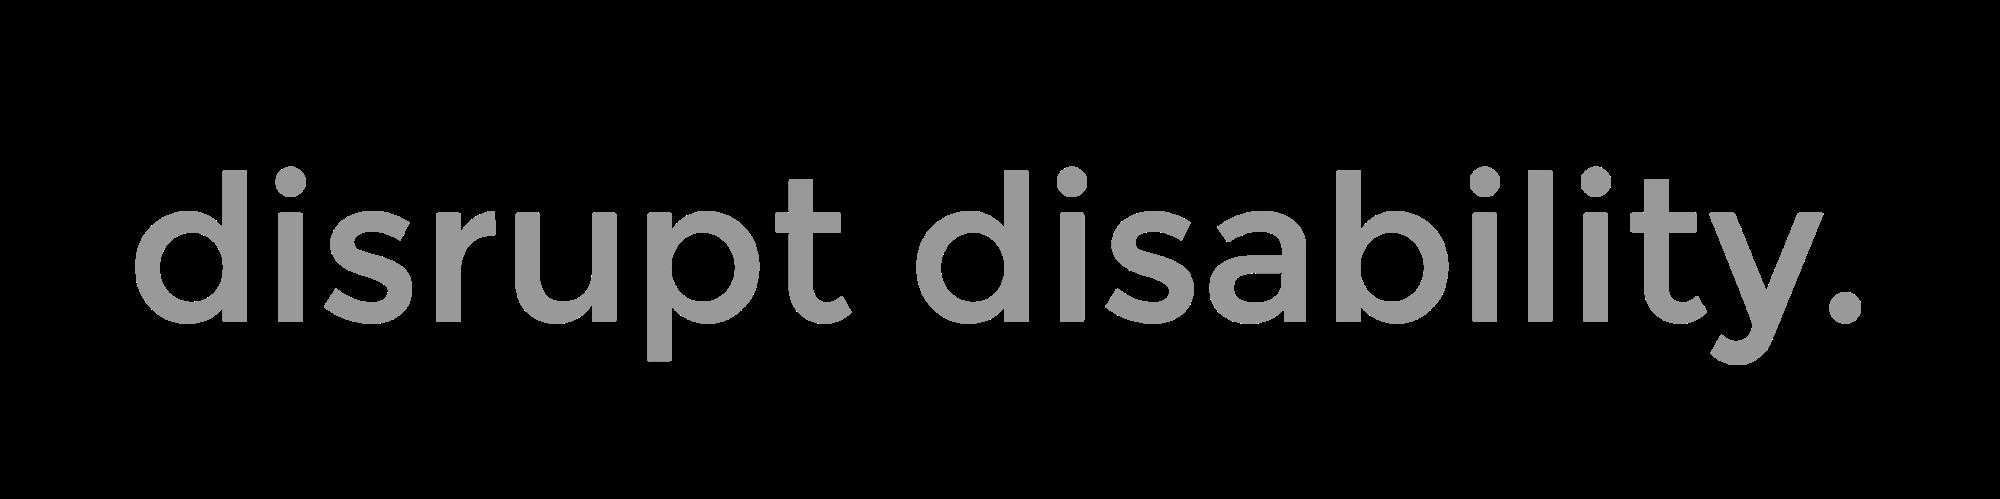 DisruptDisability